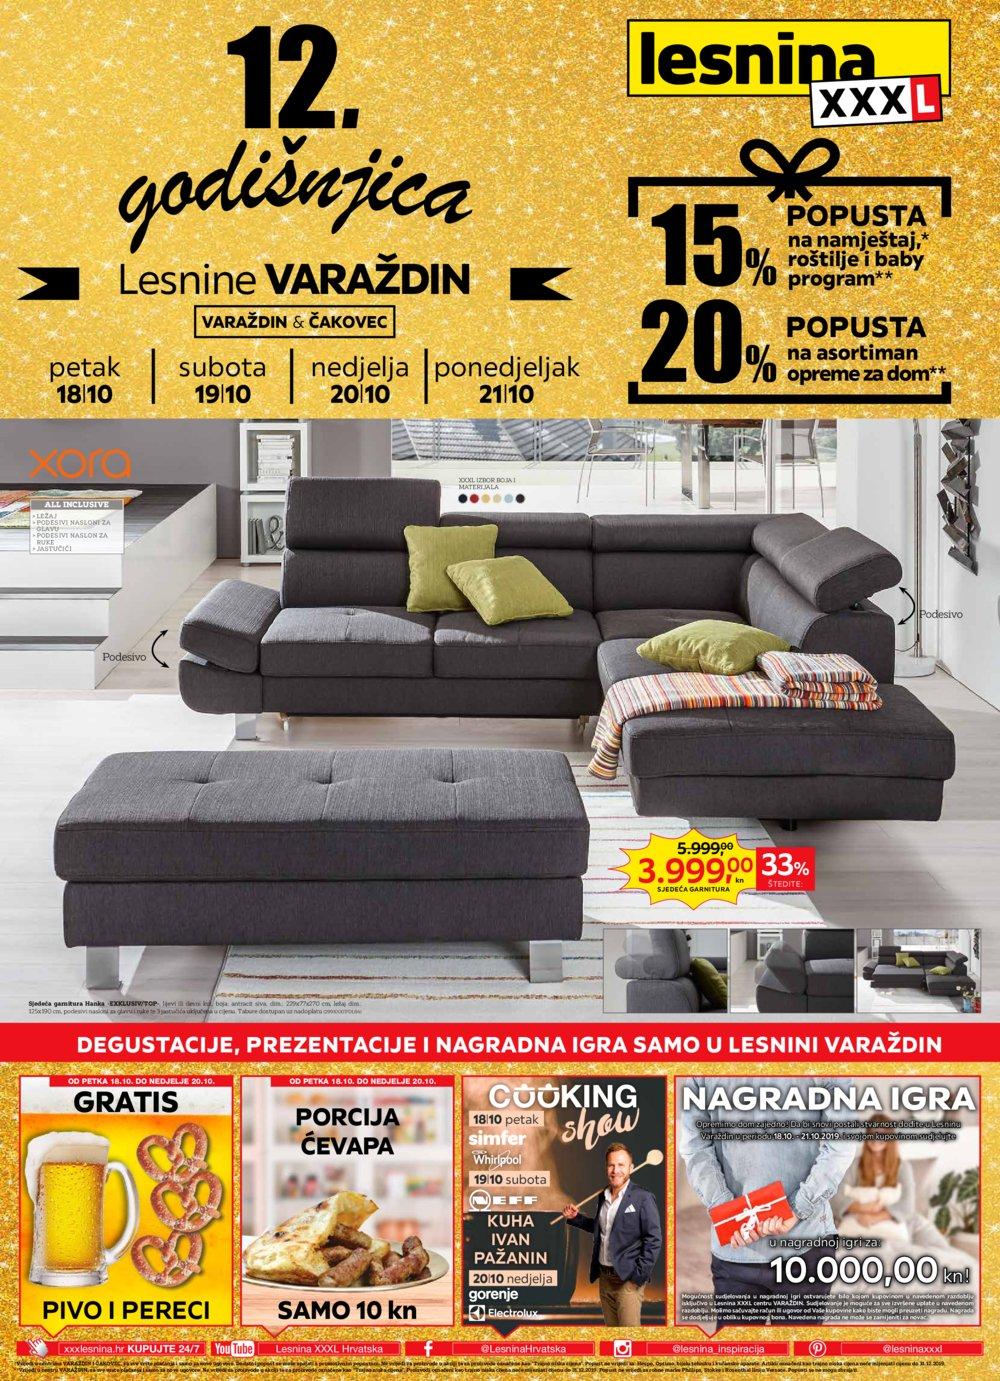 Lesnina katalog Godišnjica Varaždina 18.10. - 21.10.2019.